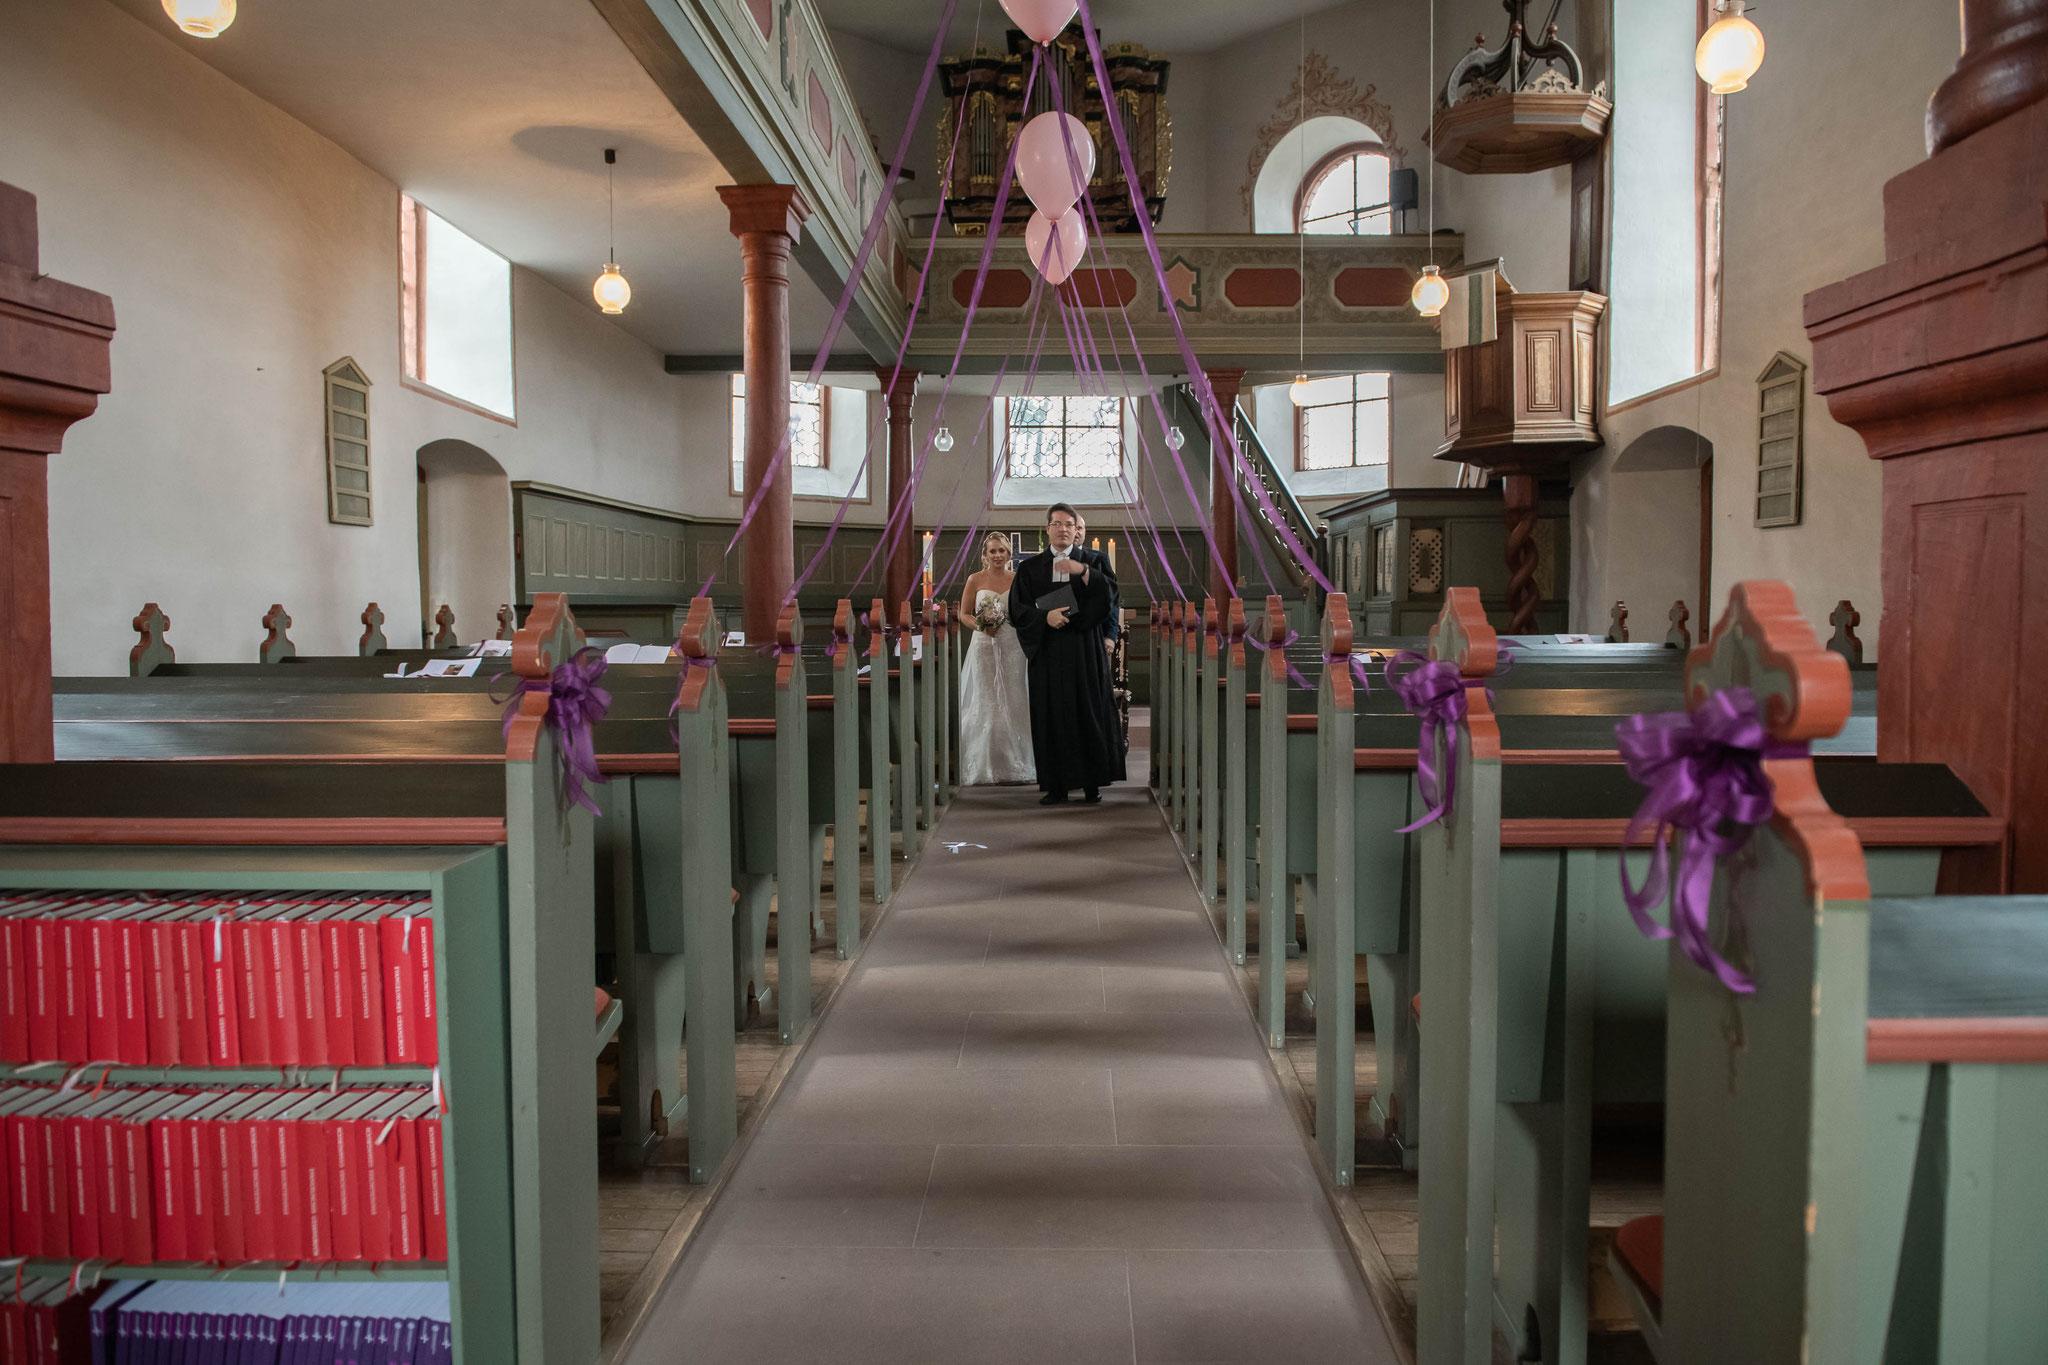 Pfarrer führt das Brautpaar aus der Kirche